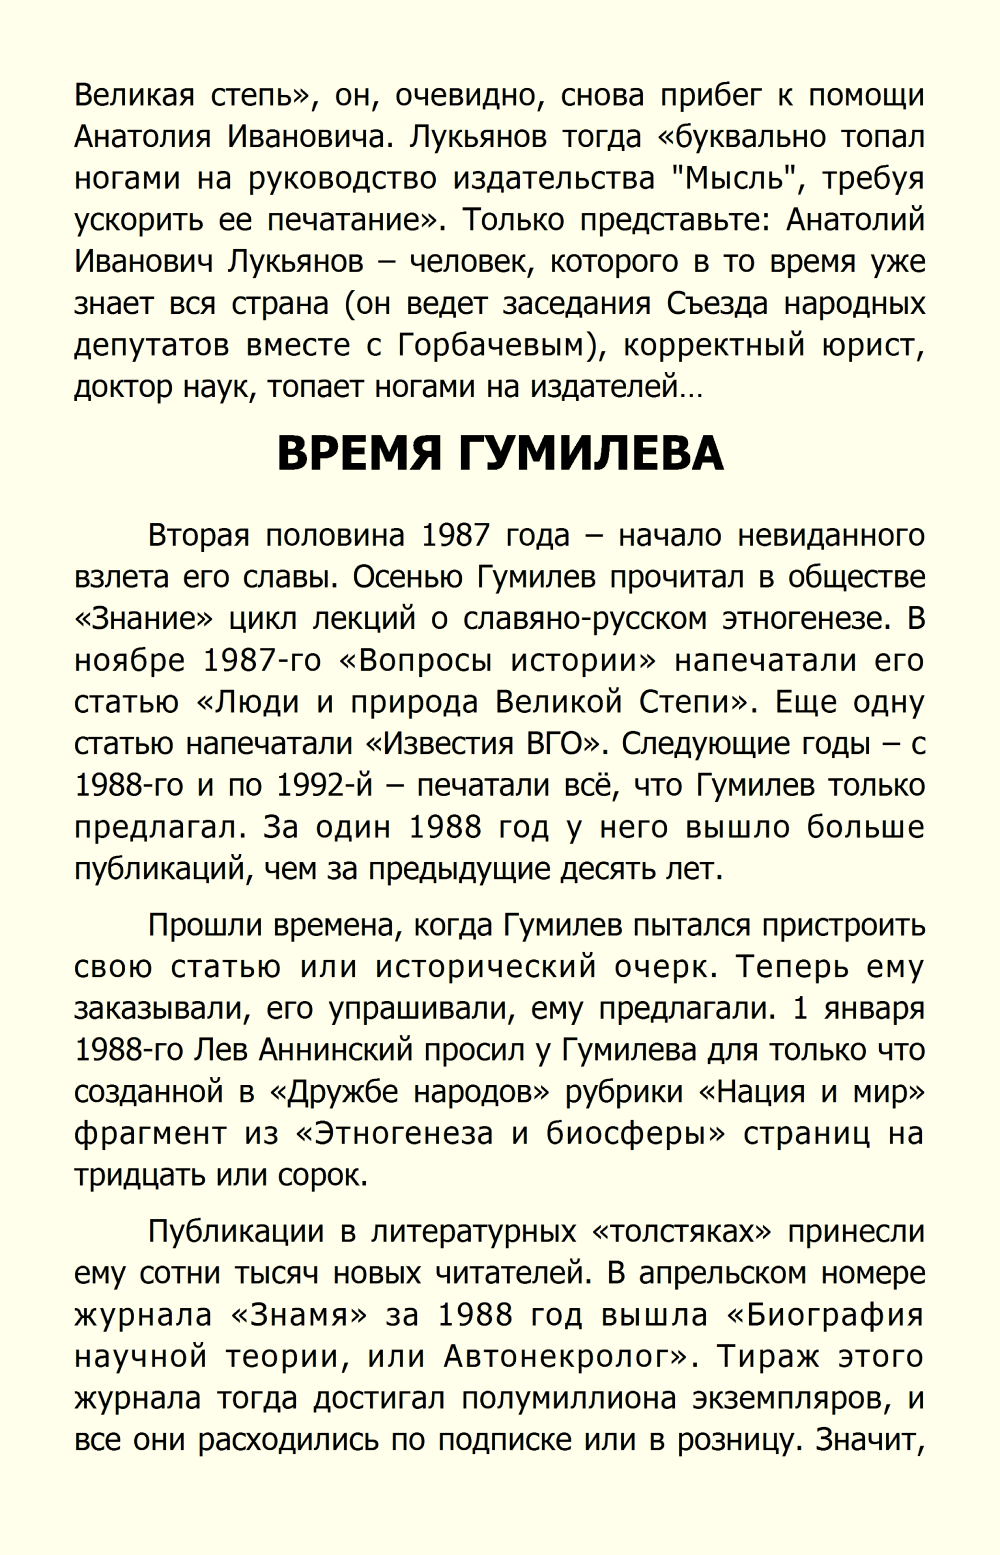 http://i5.imageban.ru/out/2013/12/12/b9deddb57518fa63006e883e22fafdc5.jpg